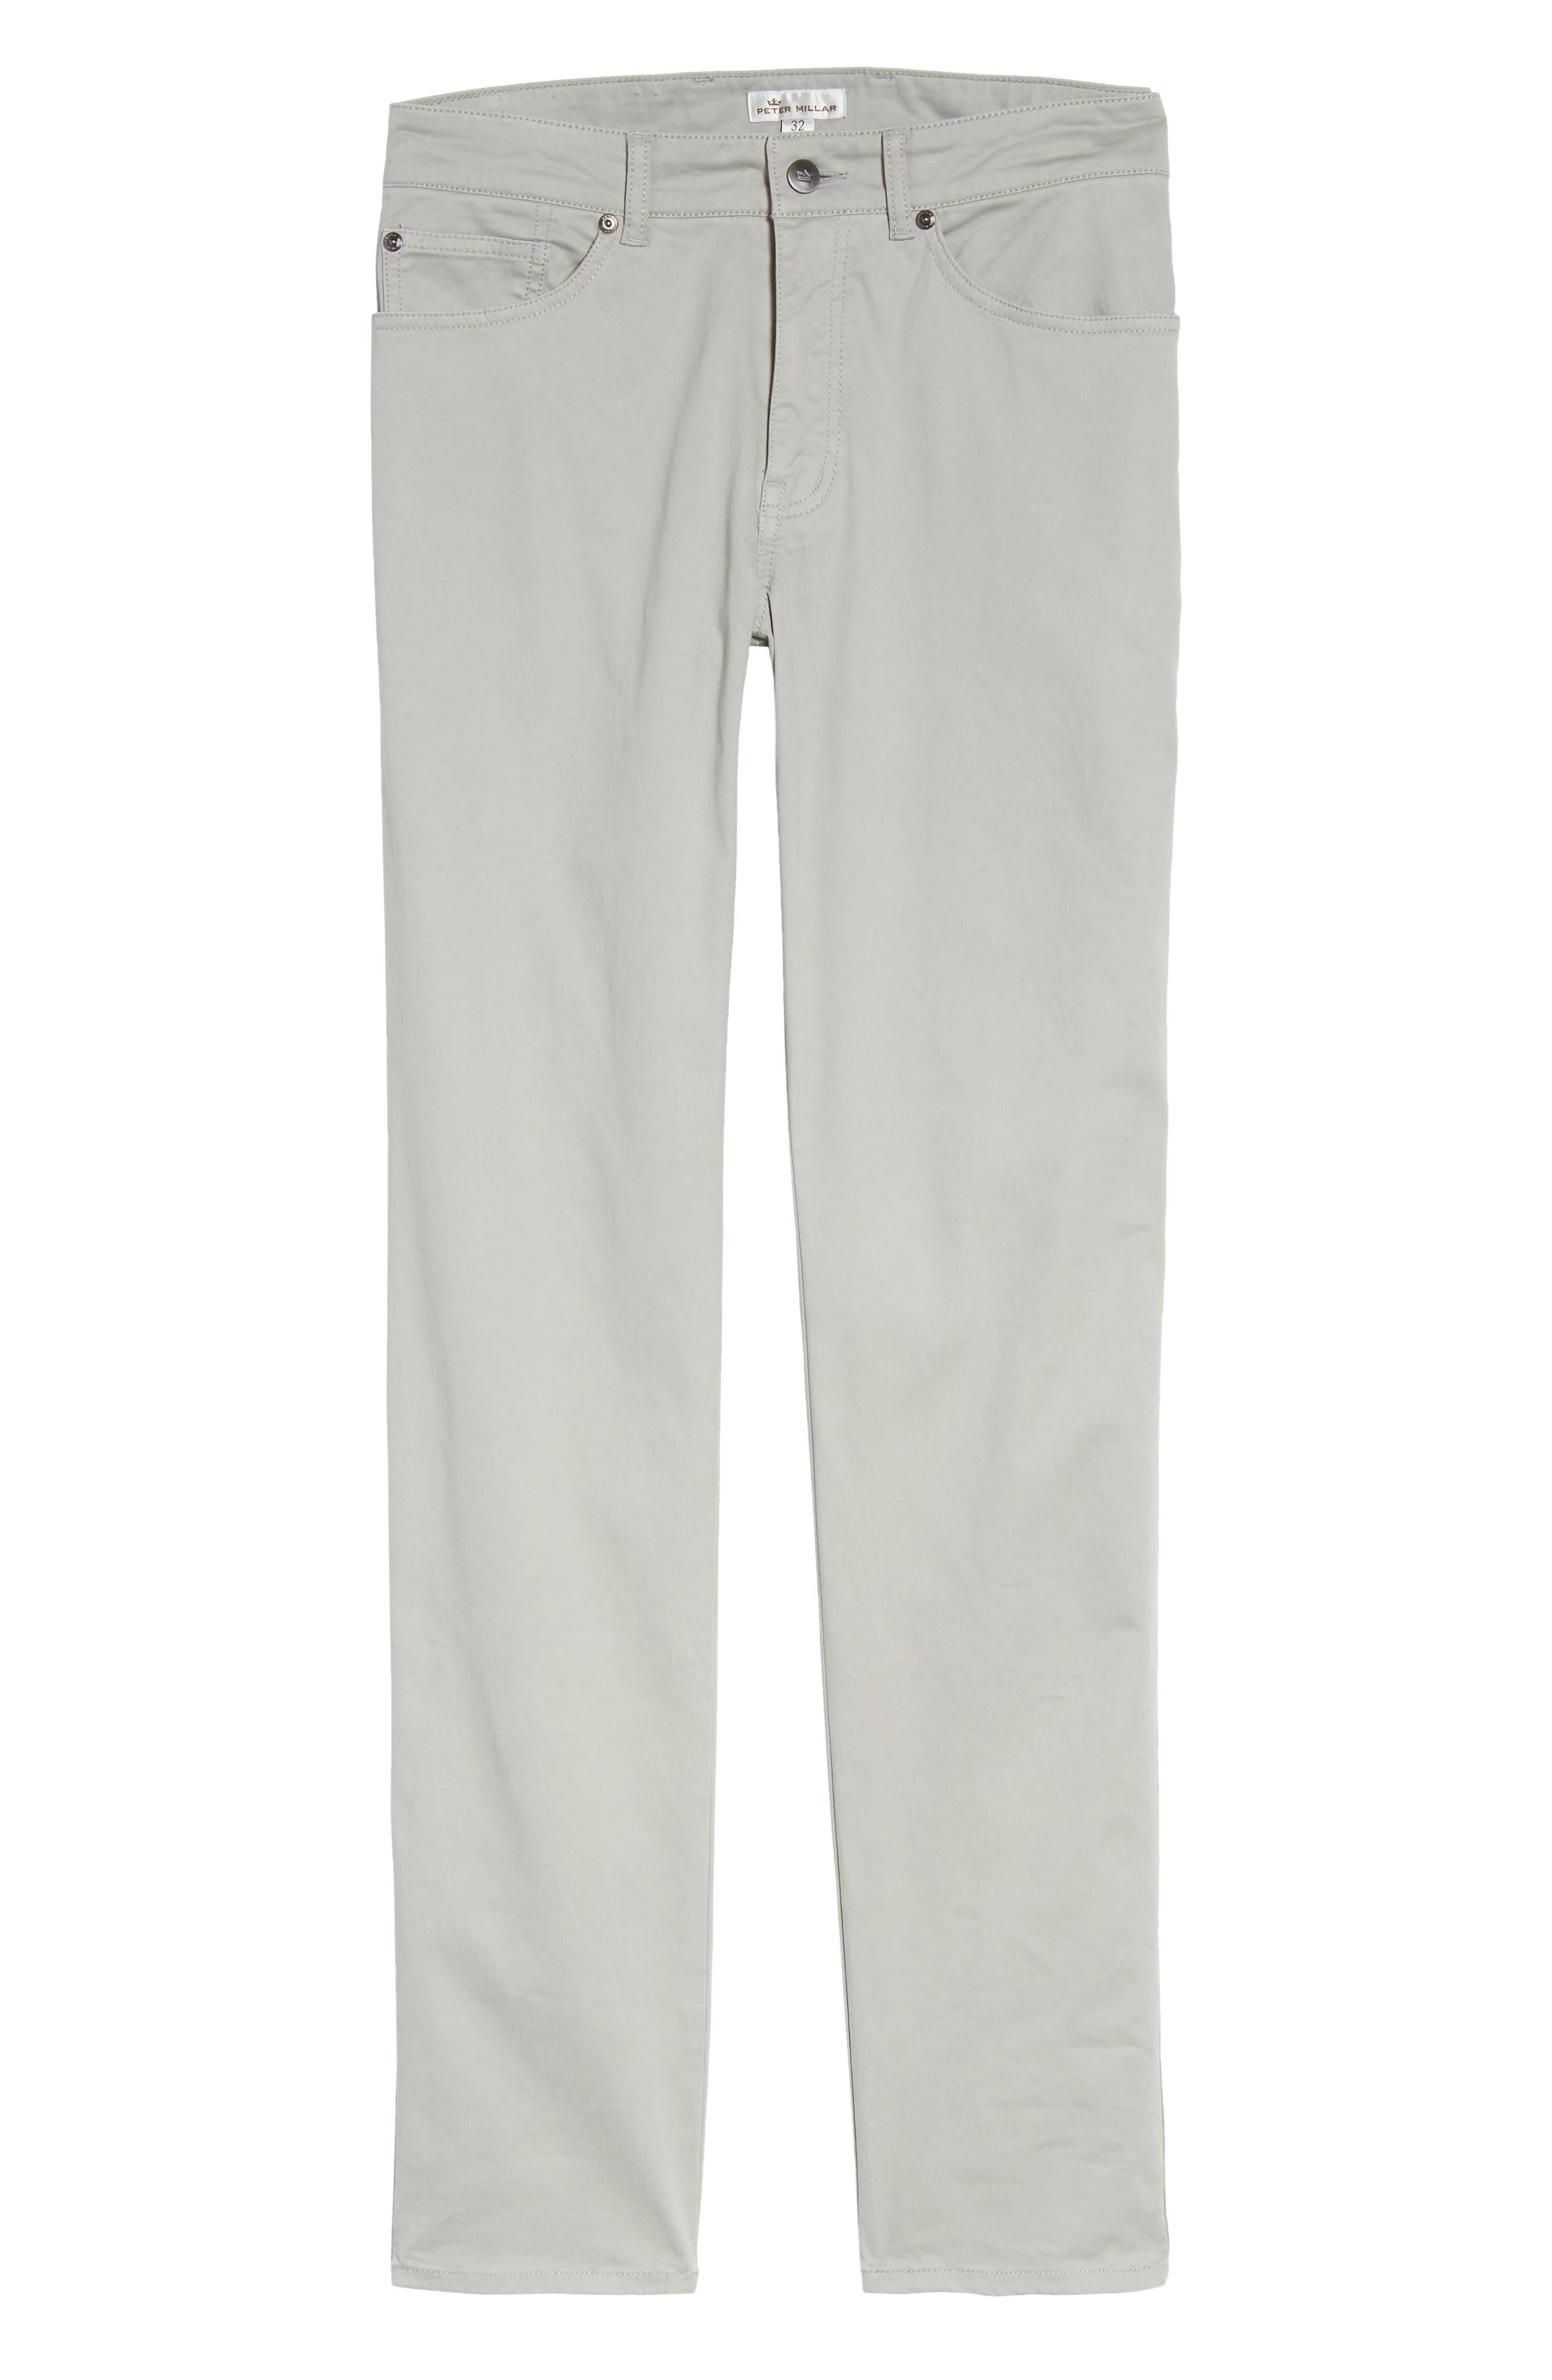 Stretch Sateen Five-Pocket Pants,                             Alternate thumbnail 6, color,                             050